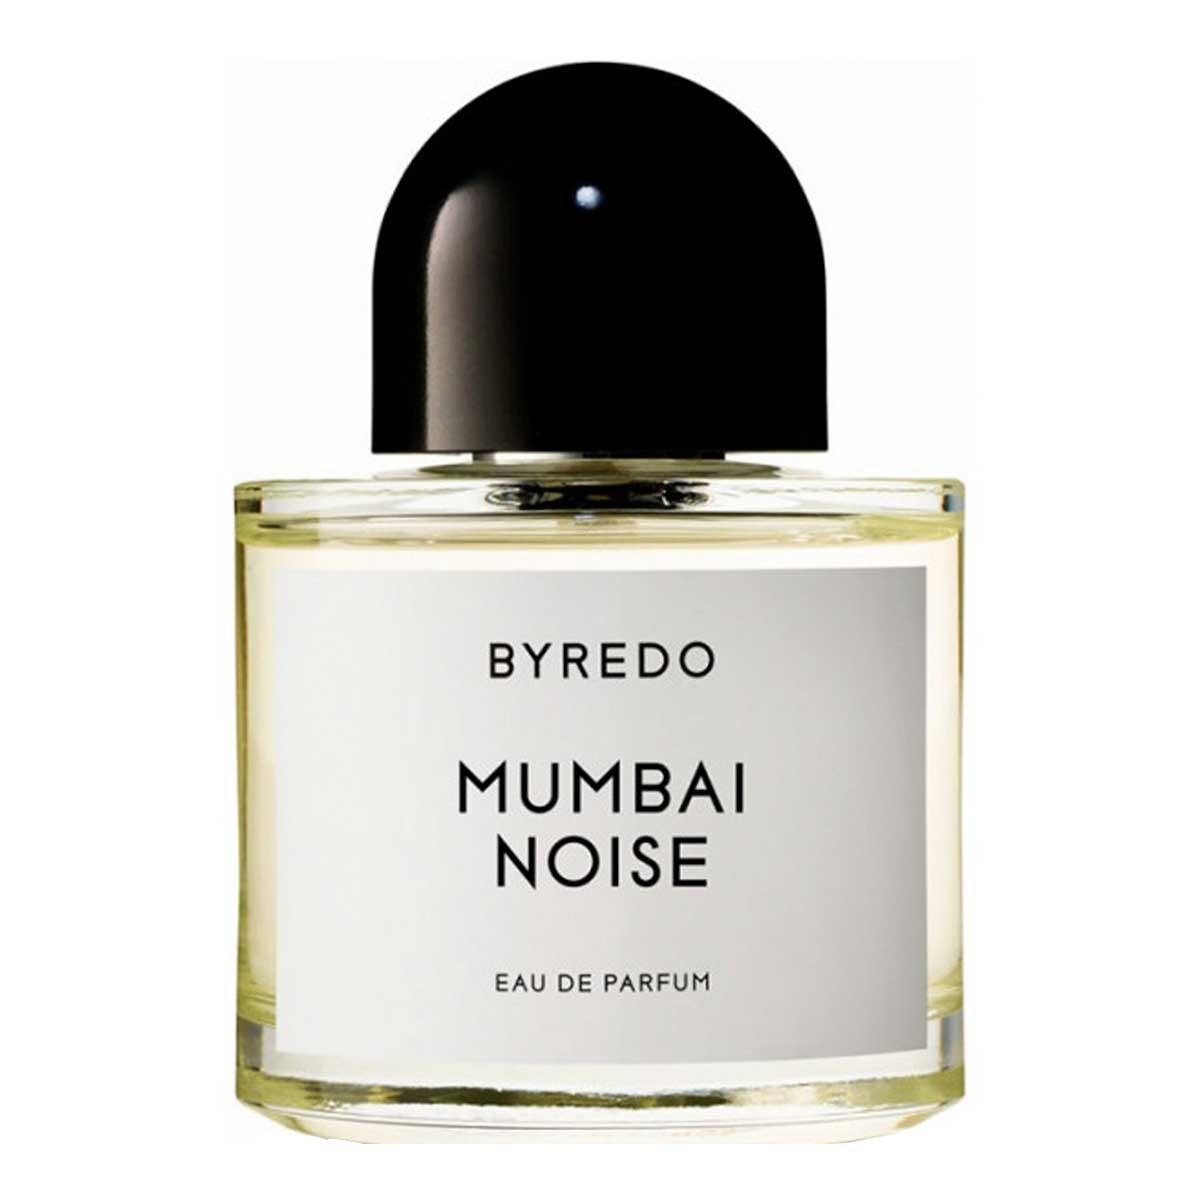 Byredo Mumbai Noise nuevo perfume byredo